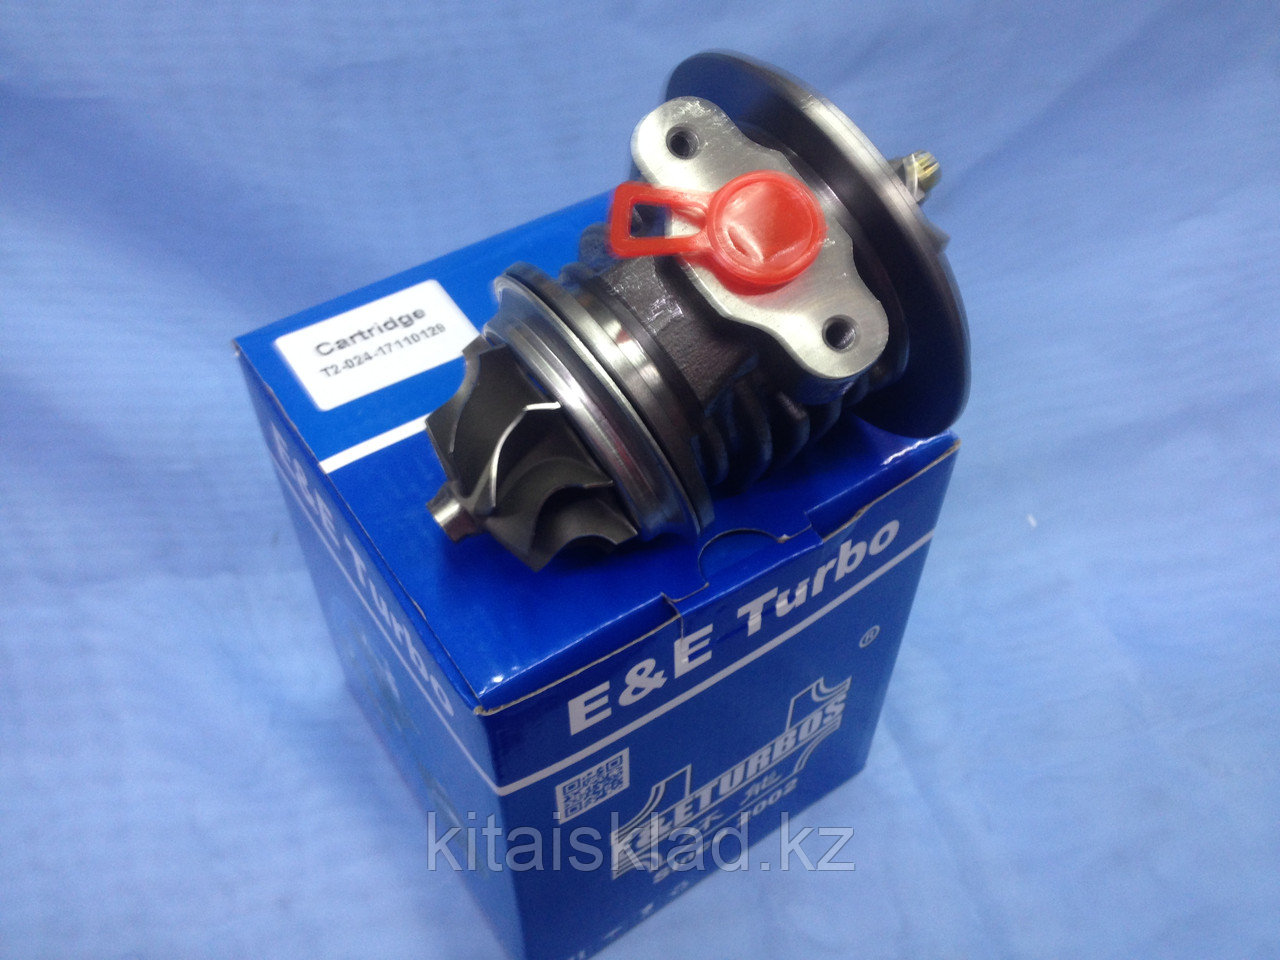 Картридж турбины Garrett A6620903080  717123-5001S.Ssang-Yong Musso 2.9TD,двигатель MERCEDES-BENZ OM662,123л.с